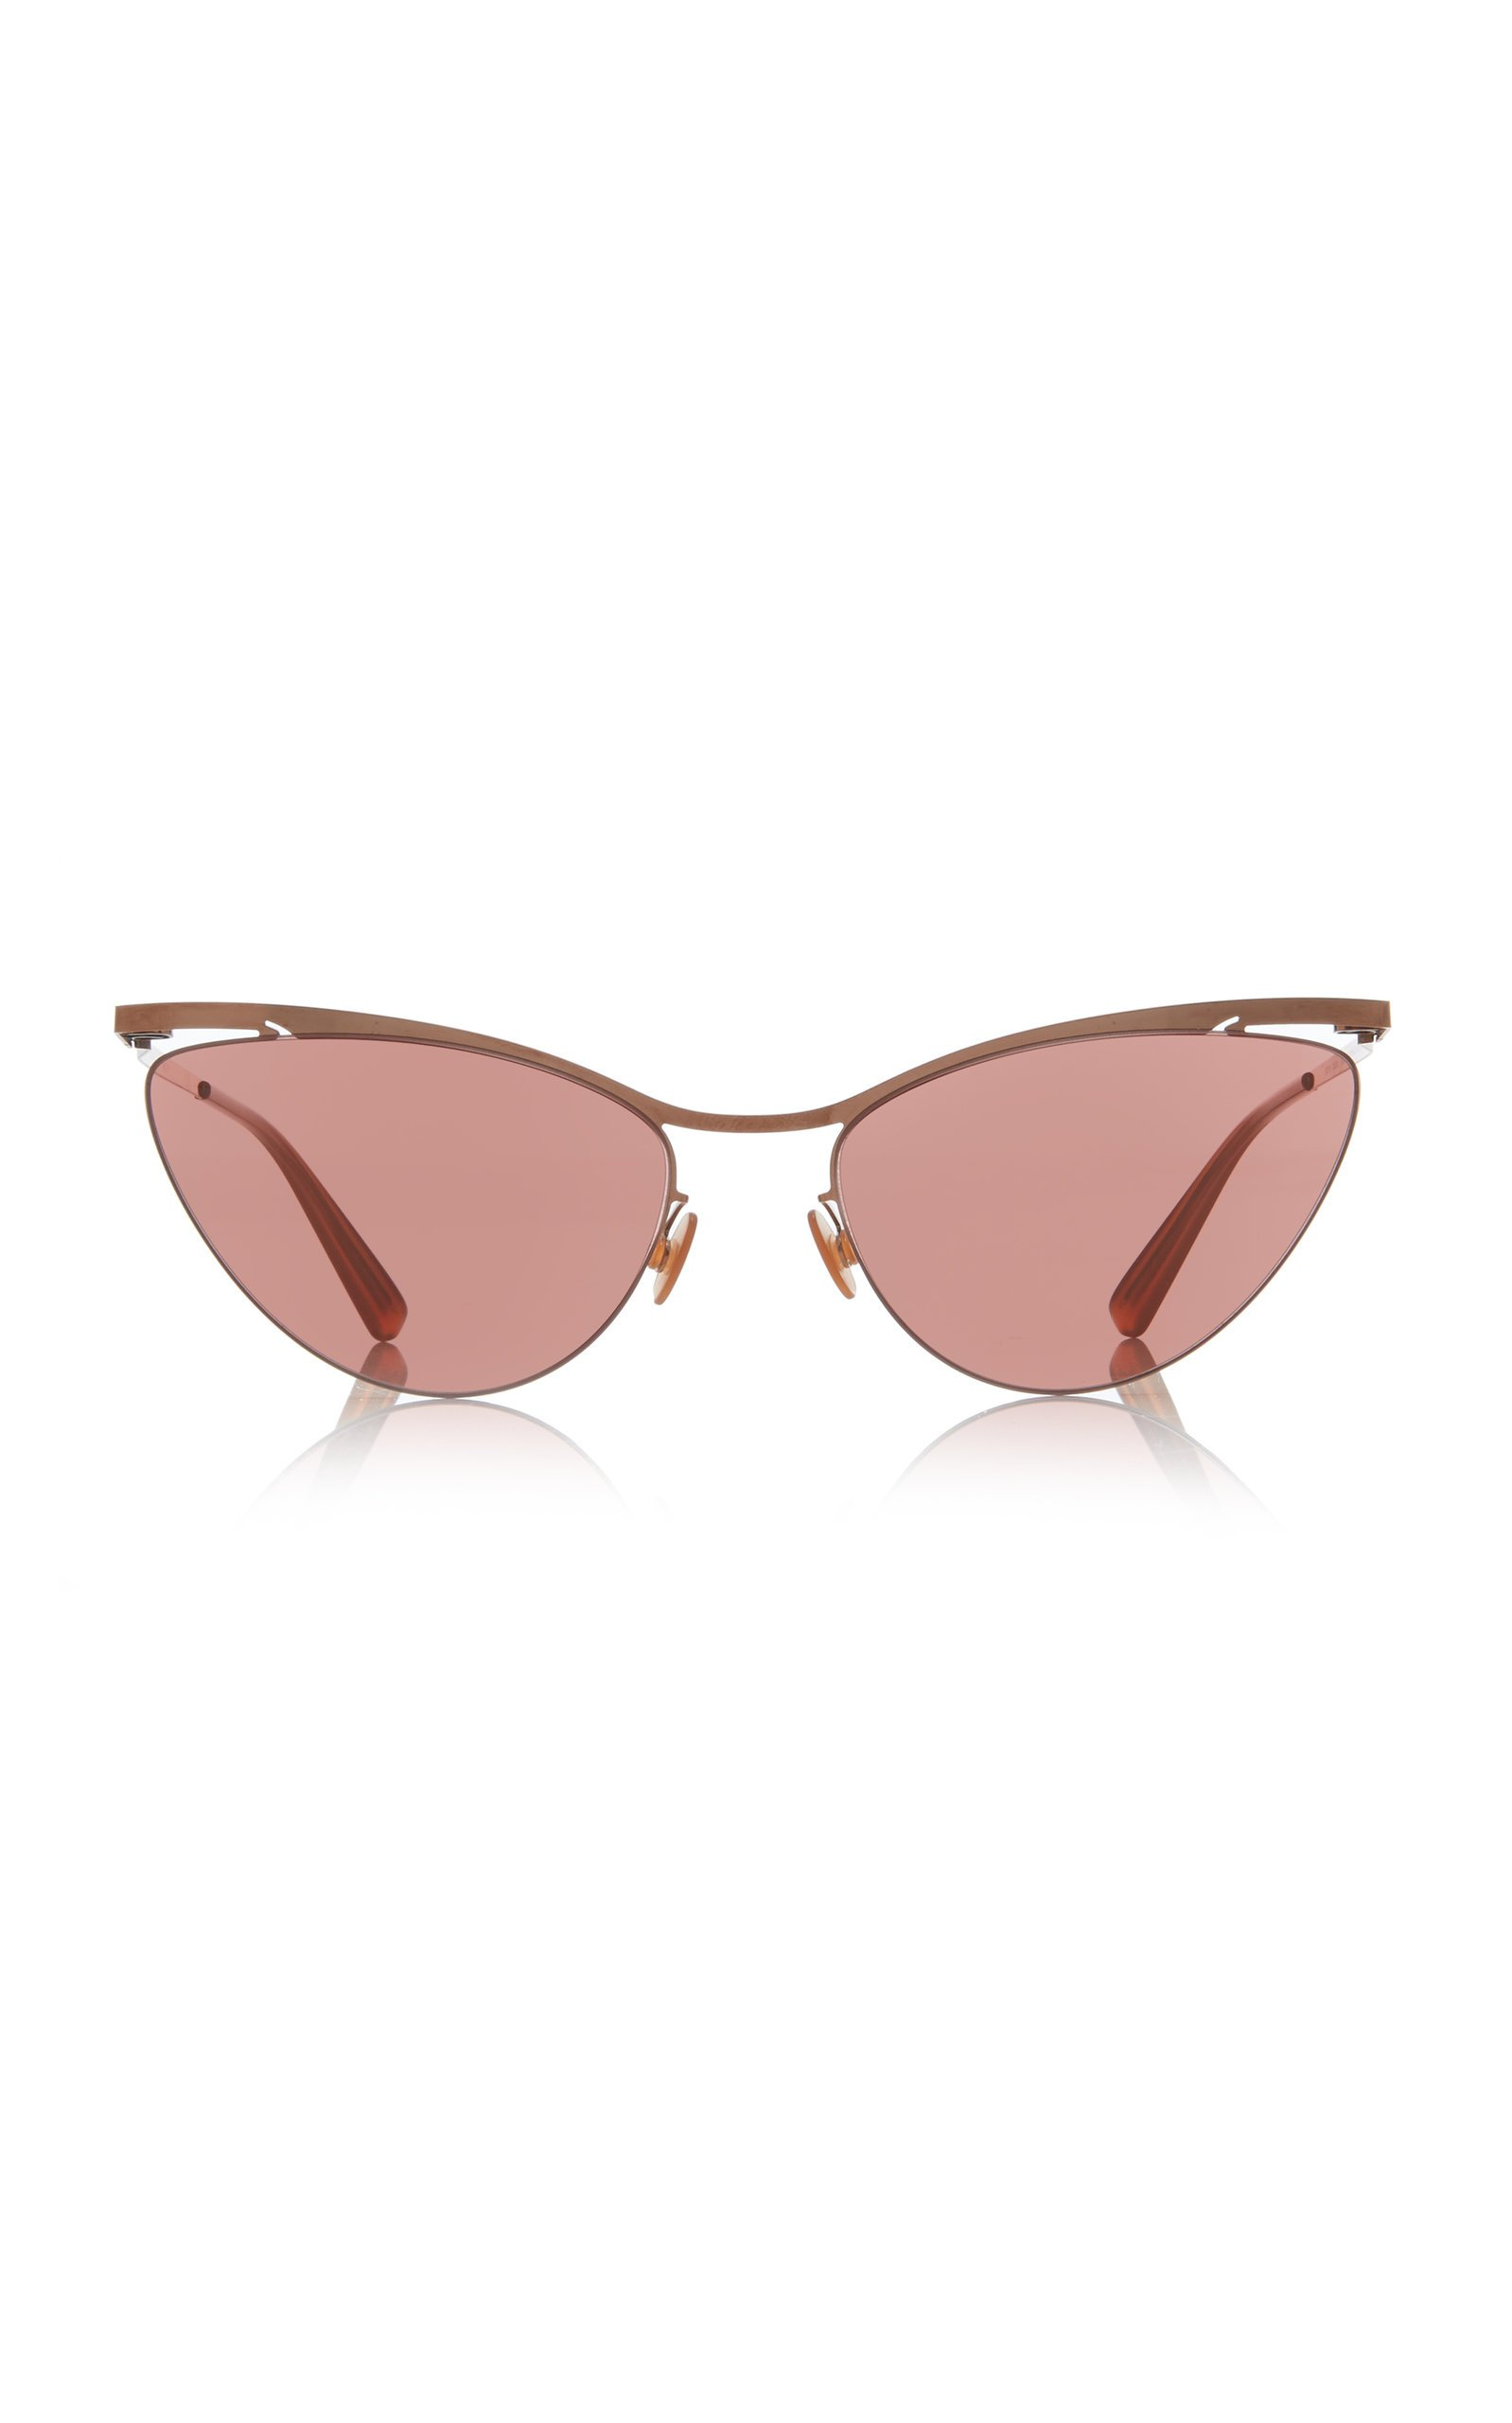 MYKITA Mizuho Cat-Eye Rose Gold-Tone Sunglasses